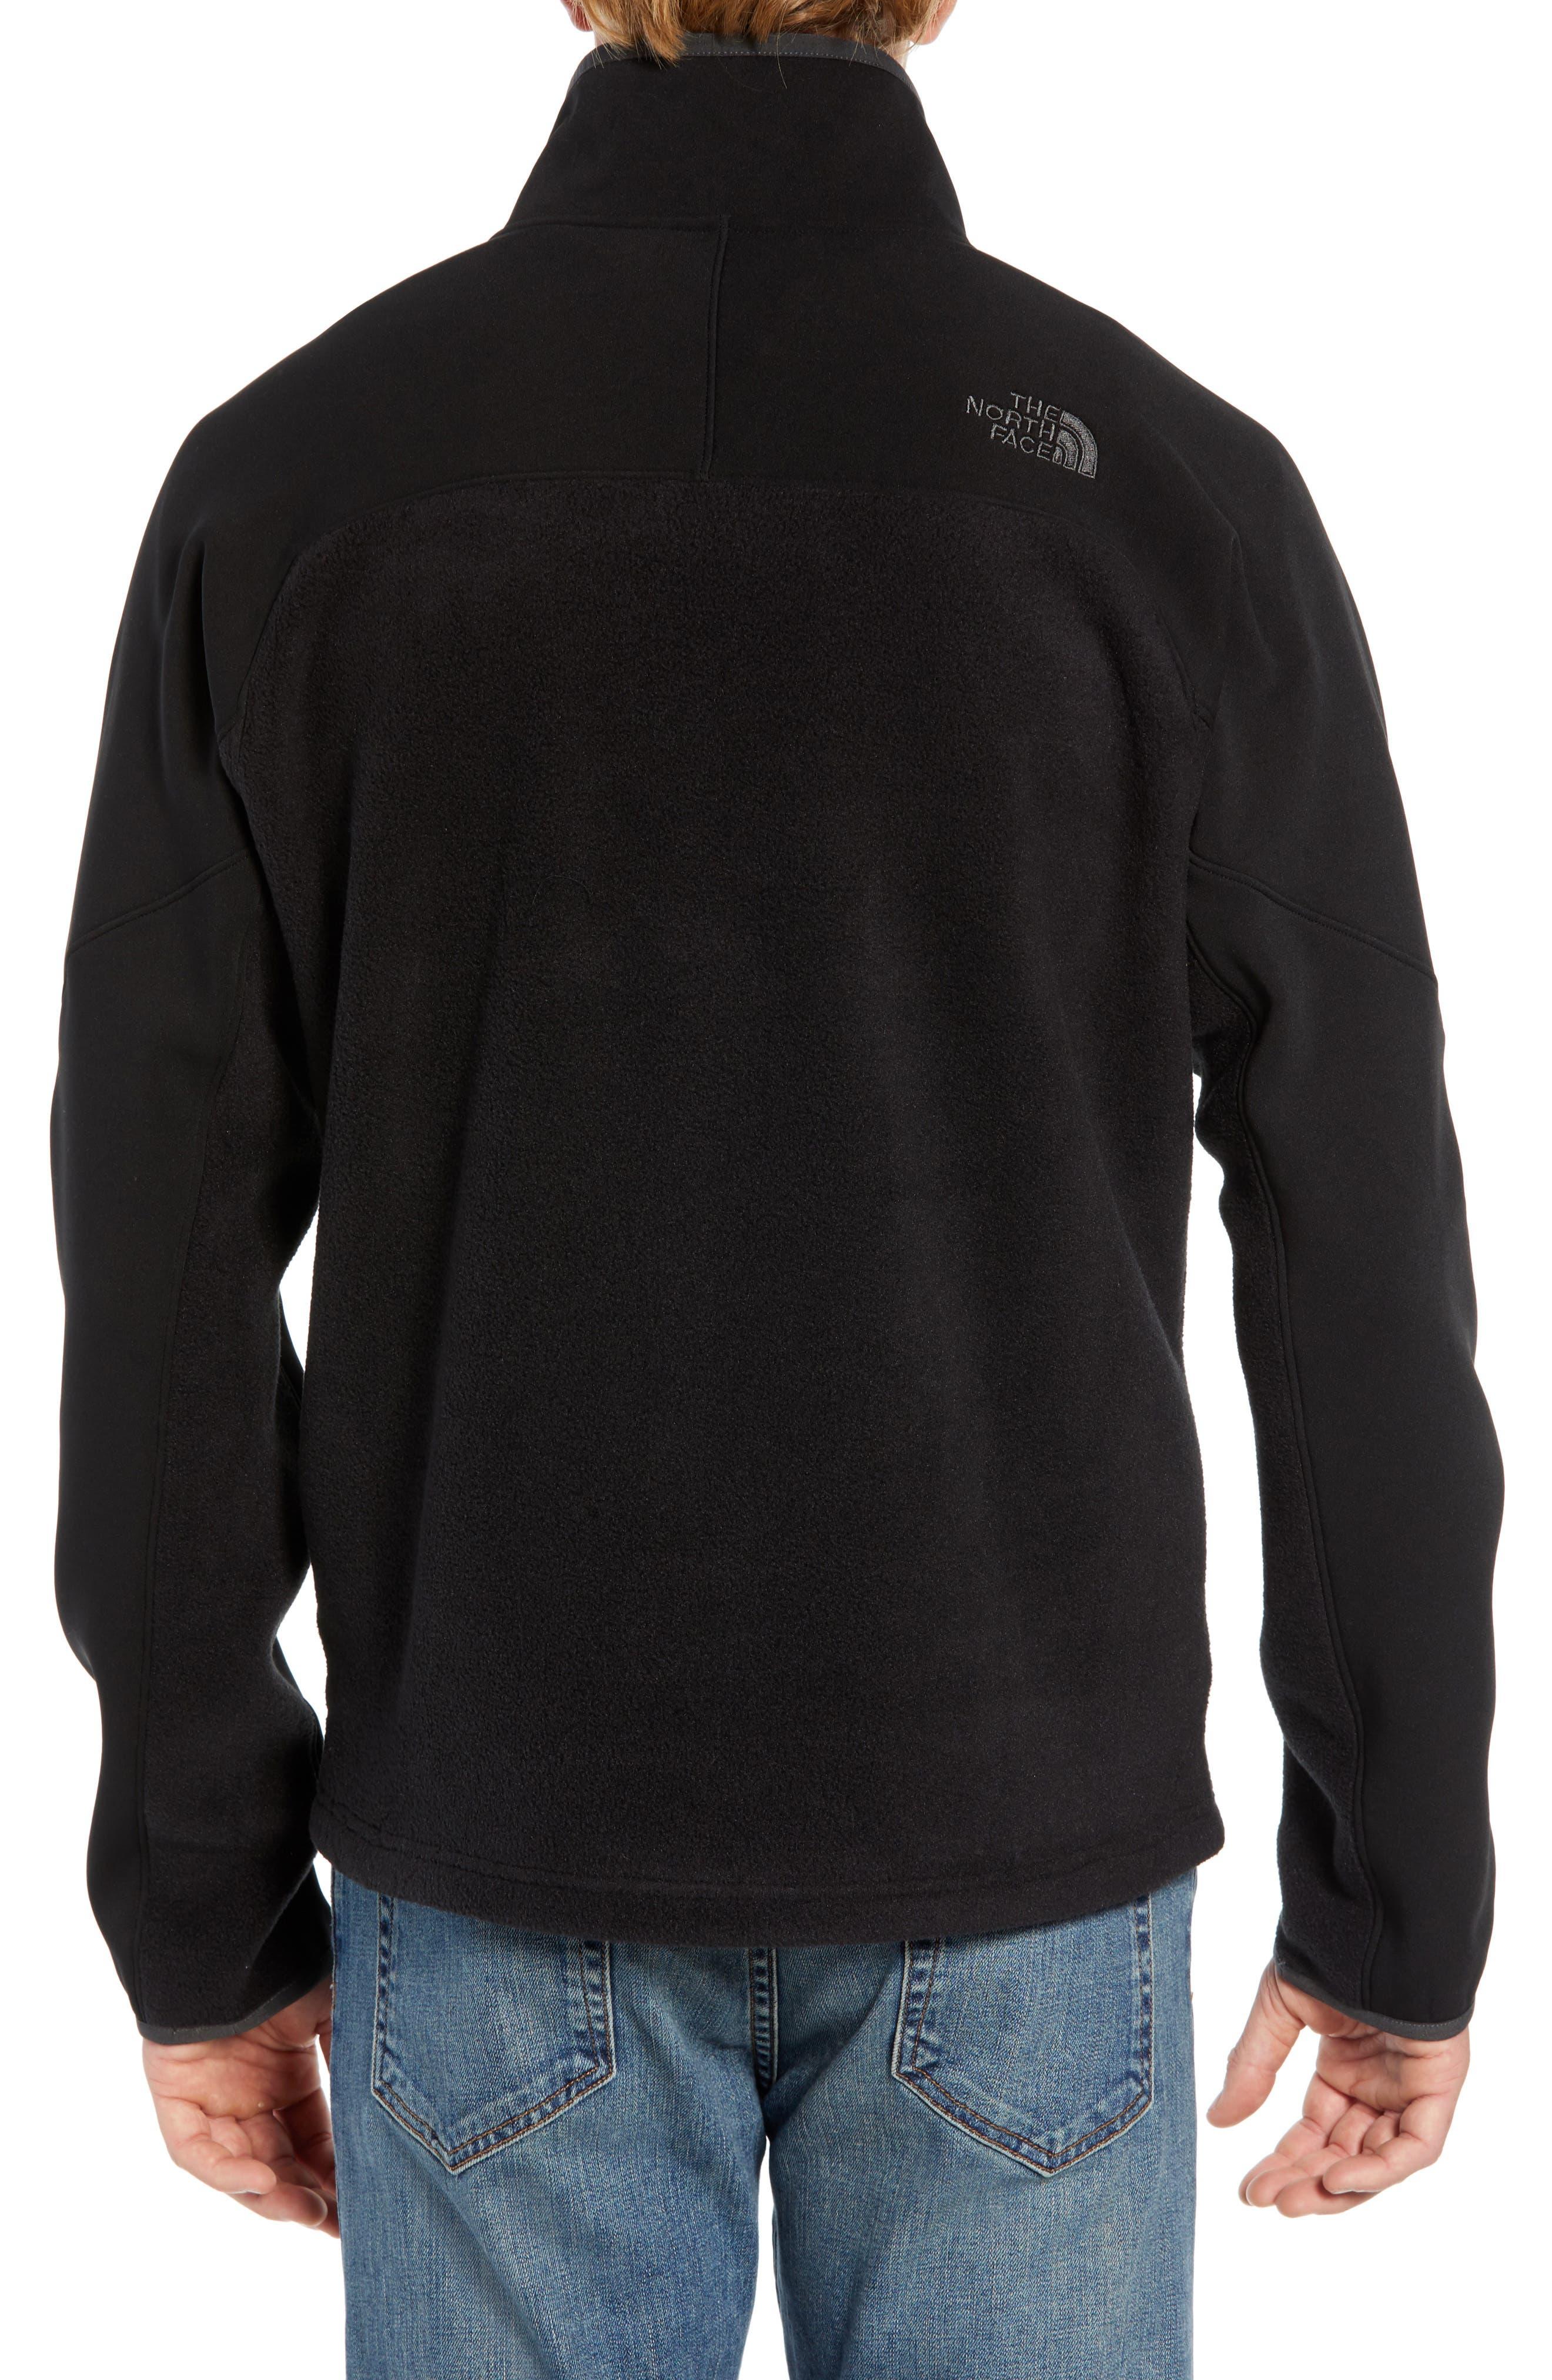 THE NORTH FACE, Tolmiepeak Hybrid Half-Zip Pullover, Alternate thumbnail 2, color, 001